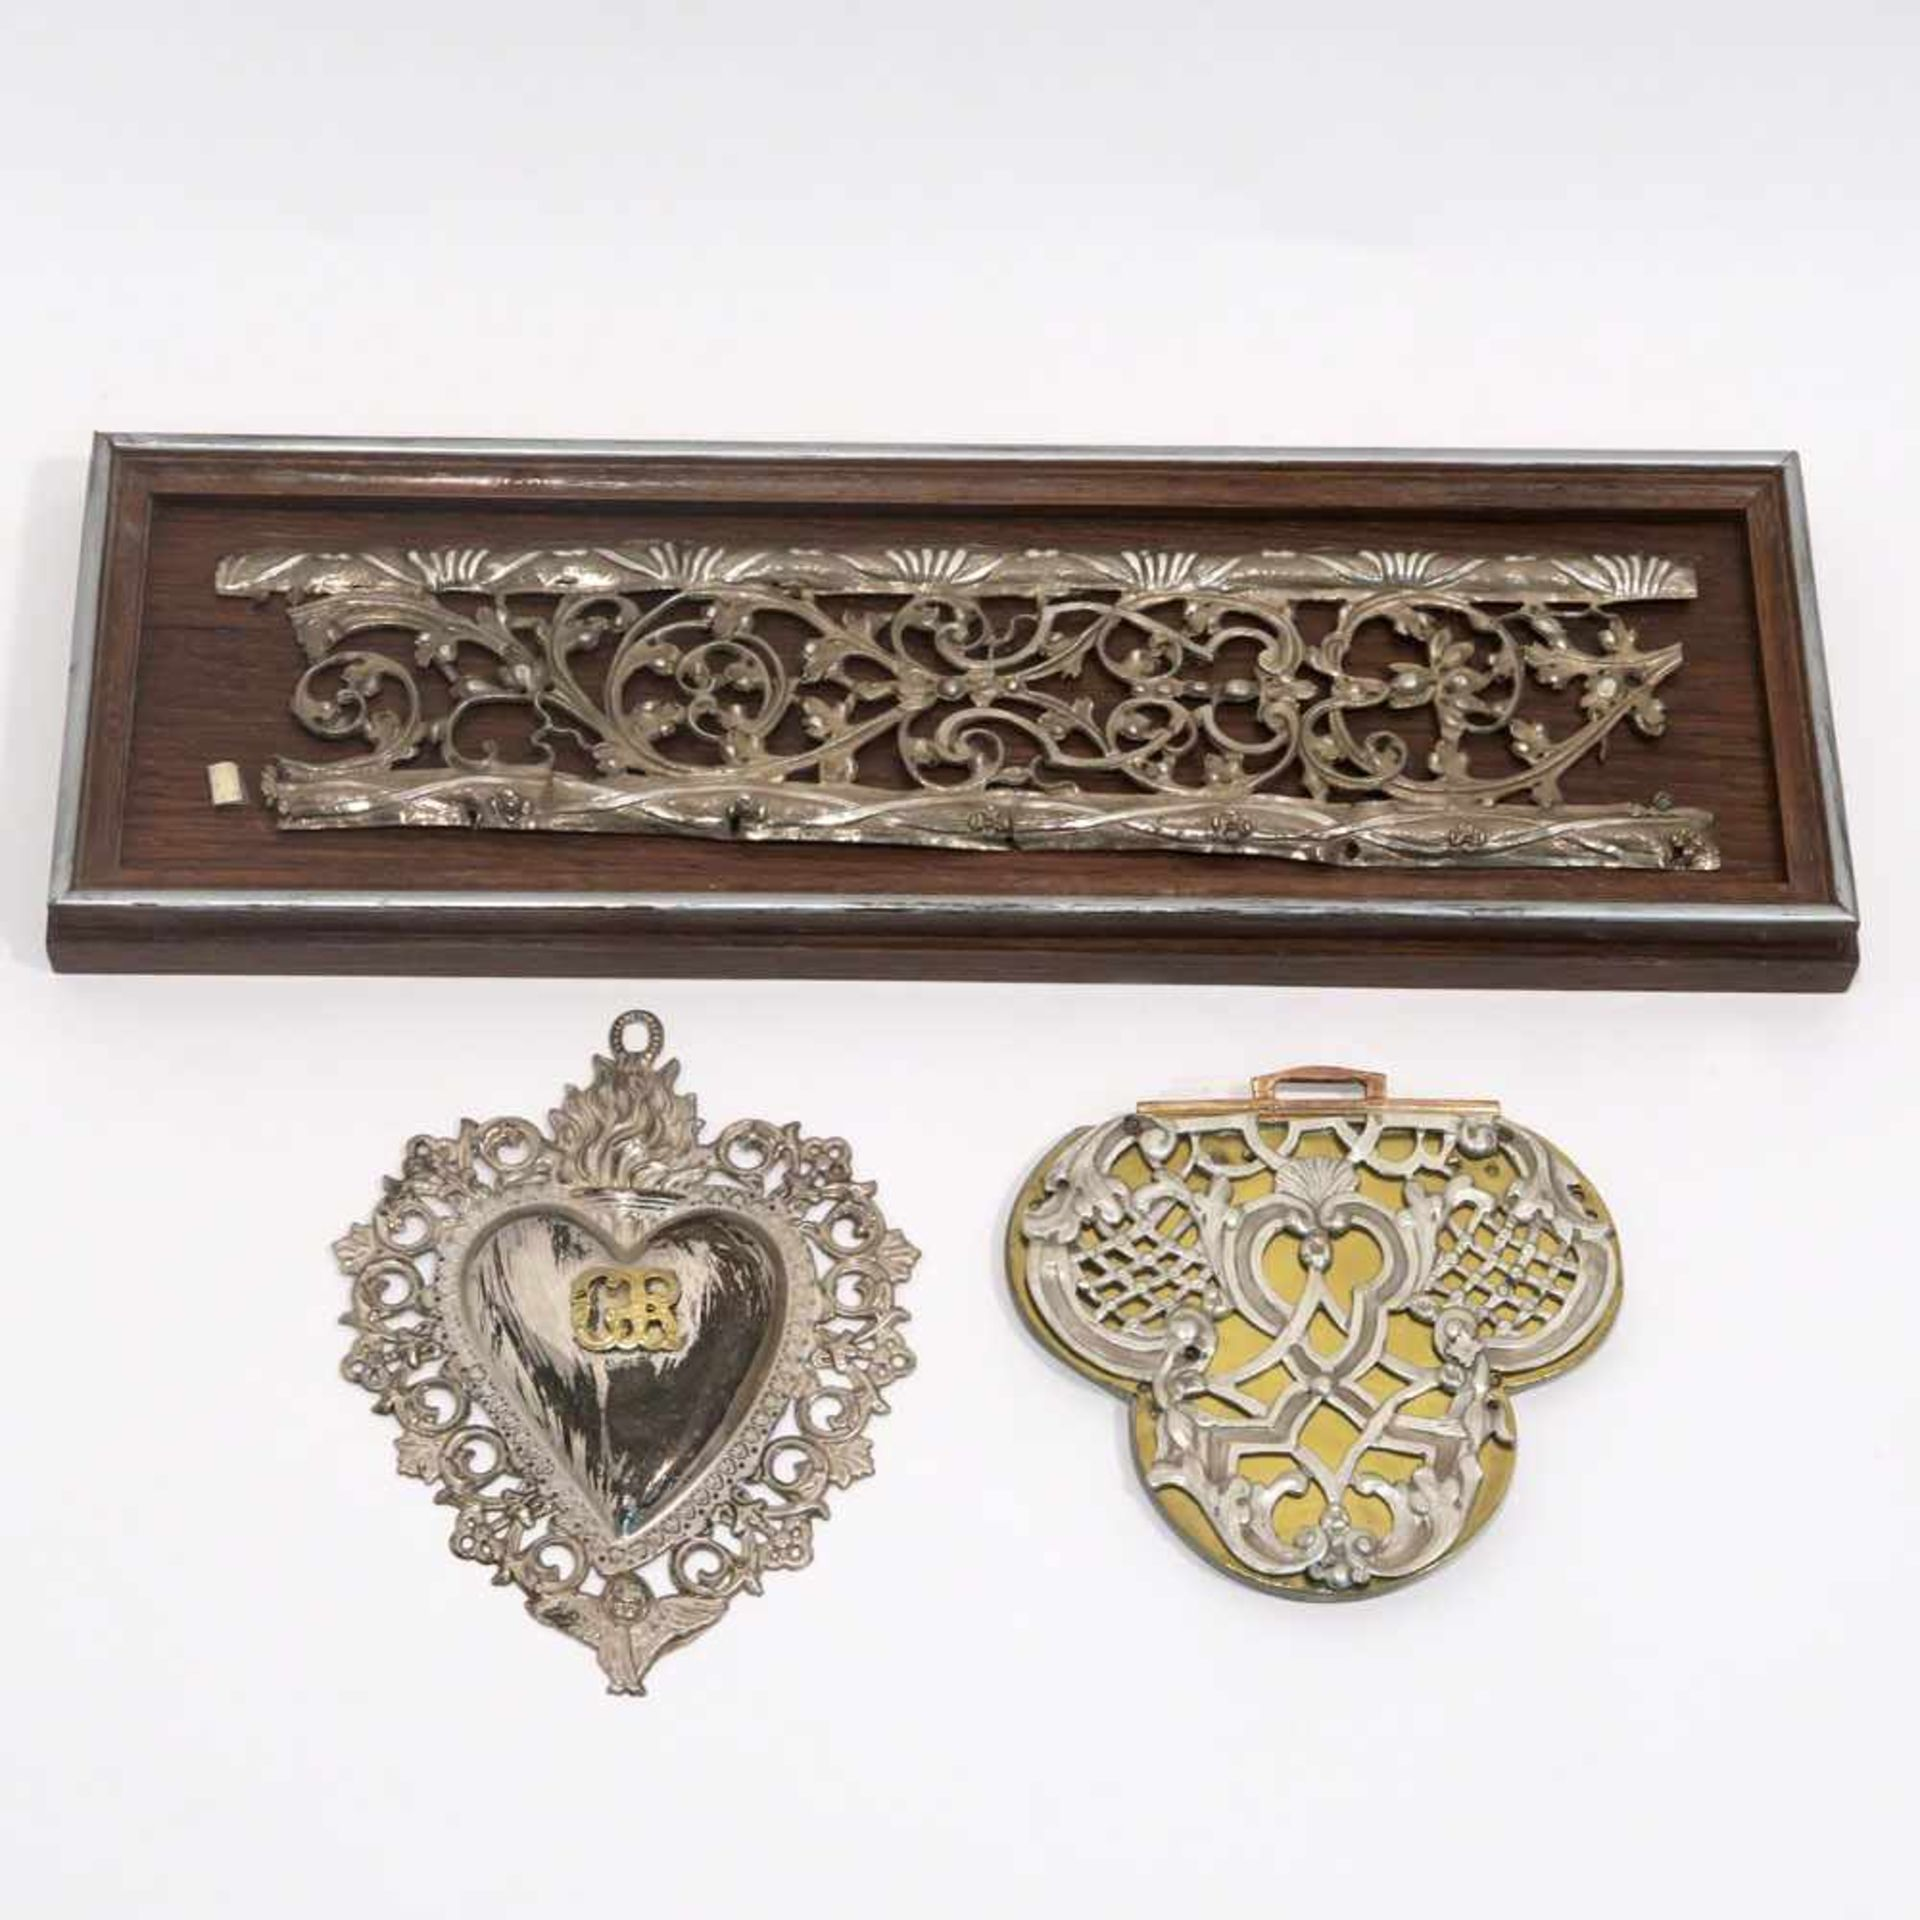 Los 29 - Zwei Silberbeschlag-OrnamenteSilber, auf Holz bzw. auf Messingblech über Holzkern. Ranken-,